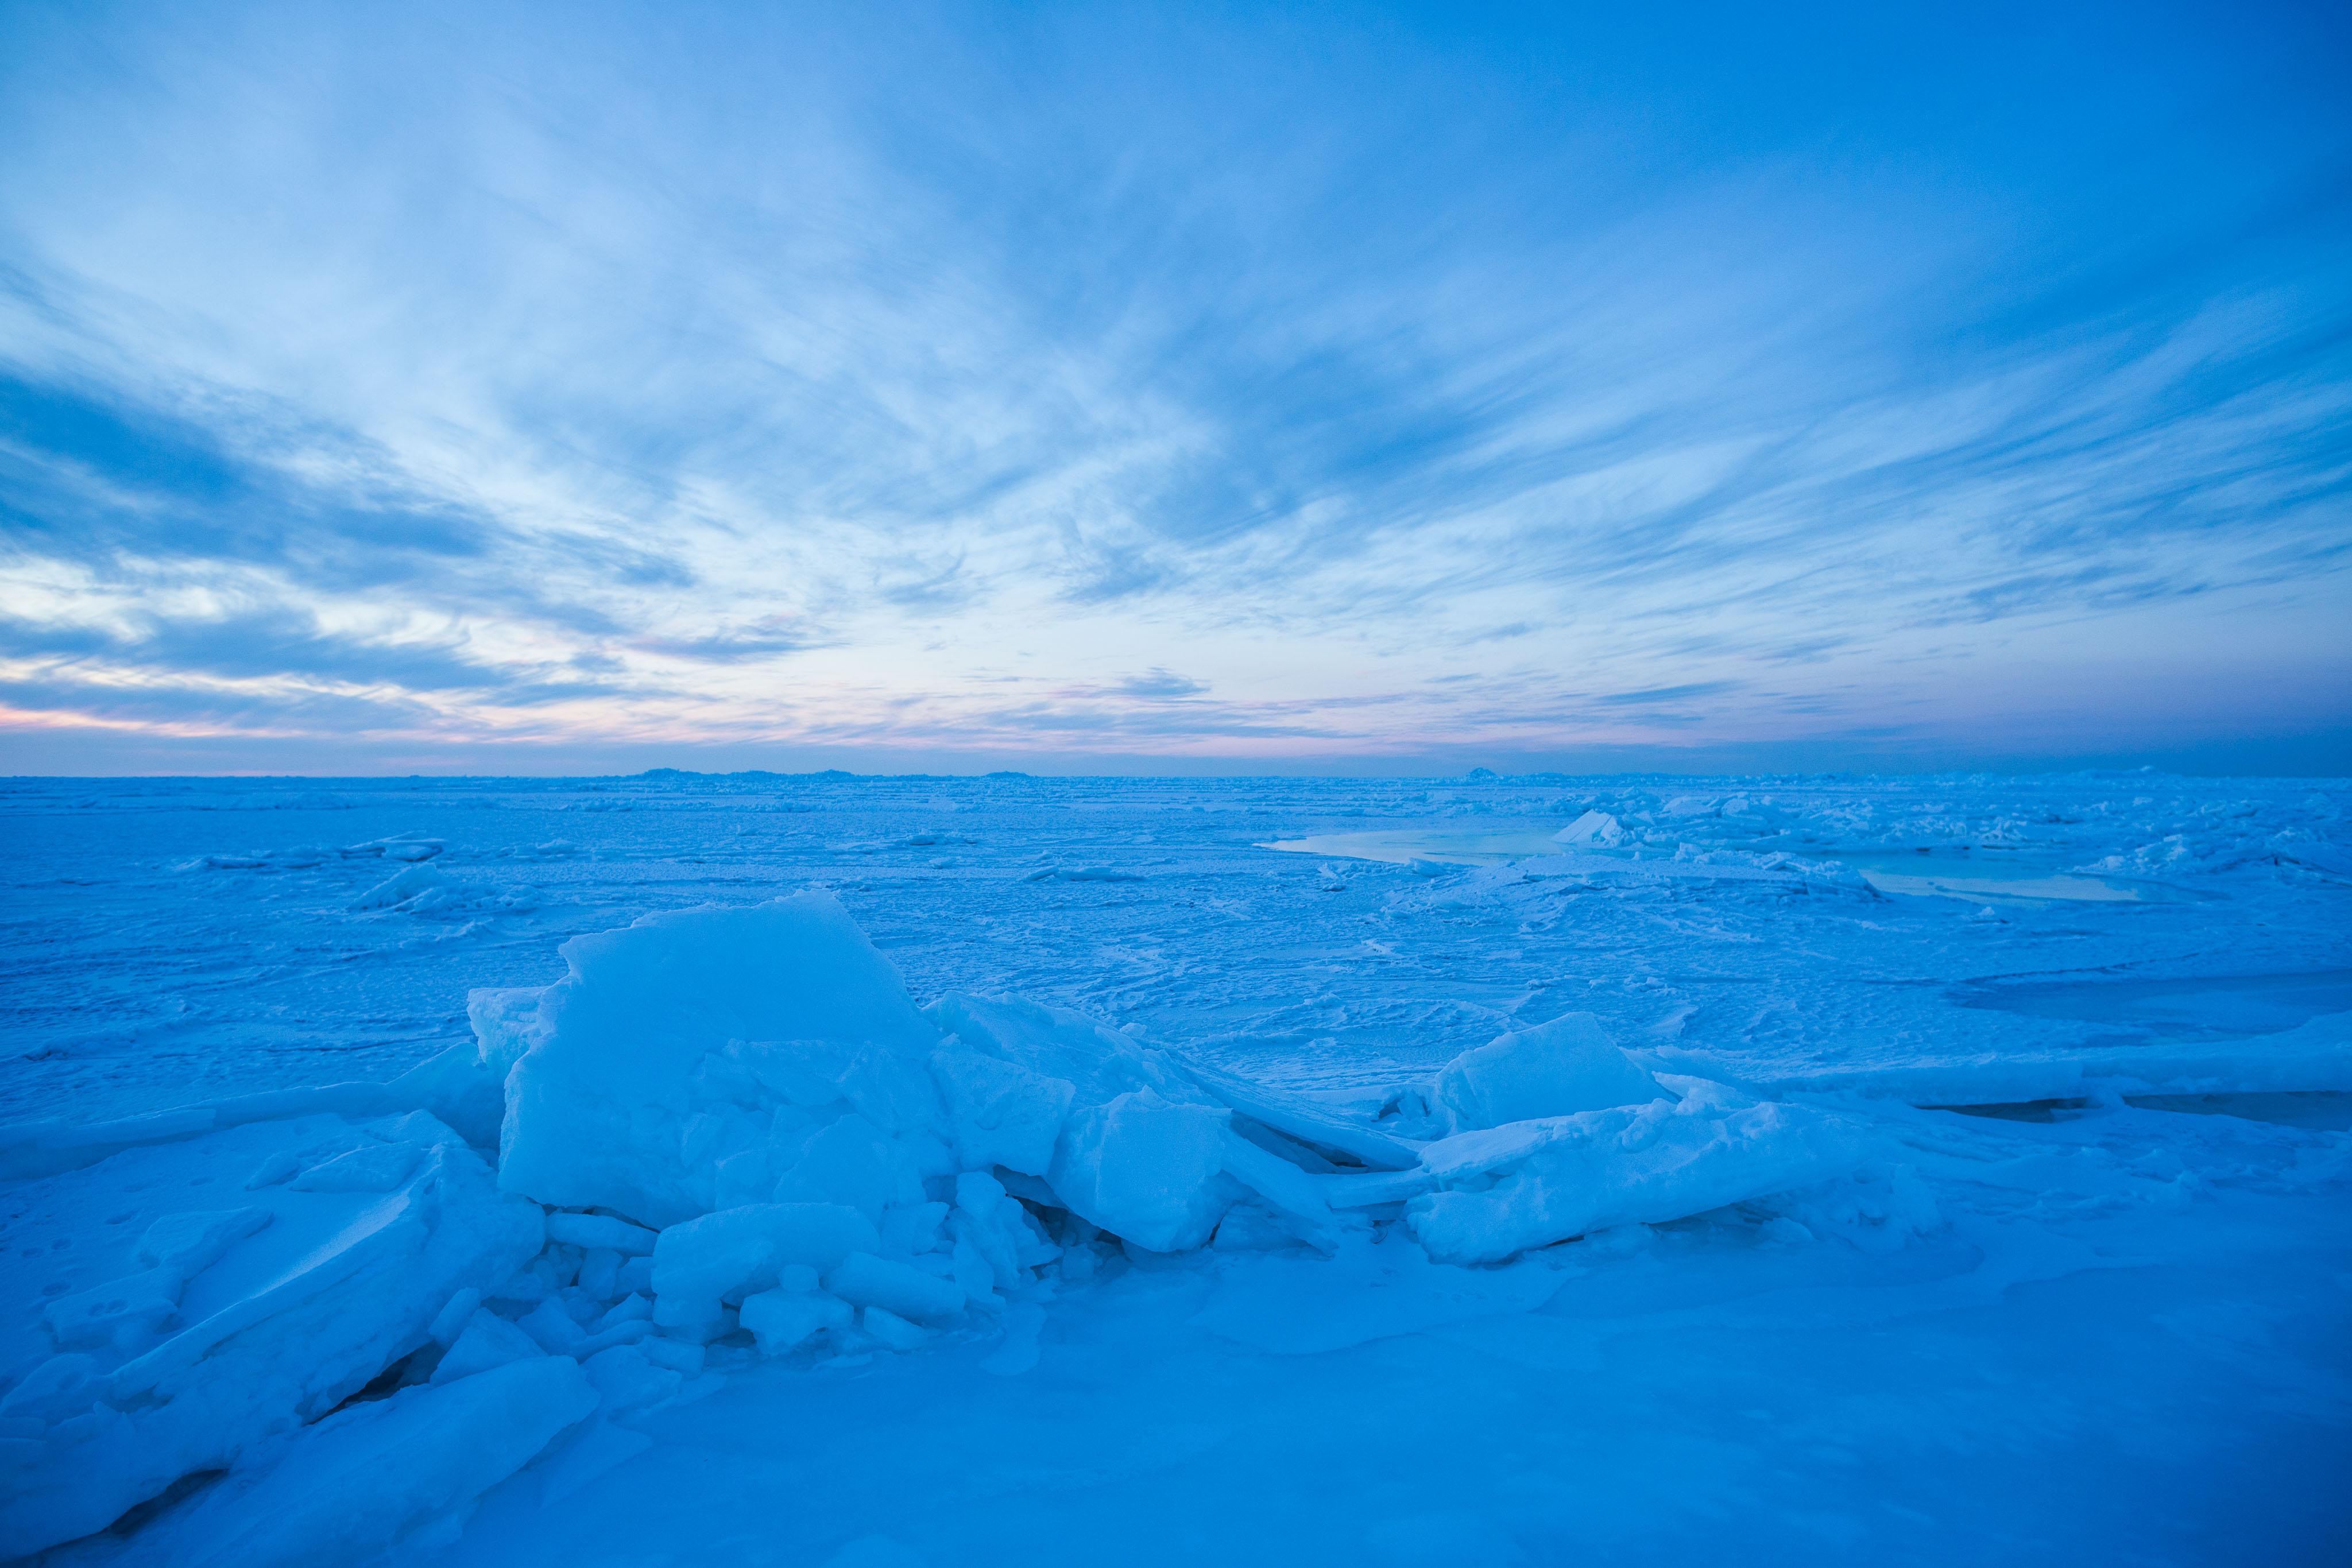 Sea ice in the Chukchi Sea, in Alaska's Arctic Ocean, near the village of Kivalina. December 10, 2012. (Loren Holmes / Alaska Dispatch News)